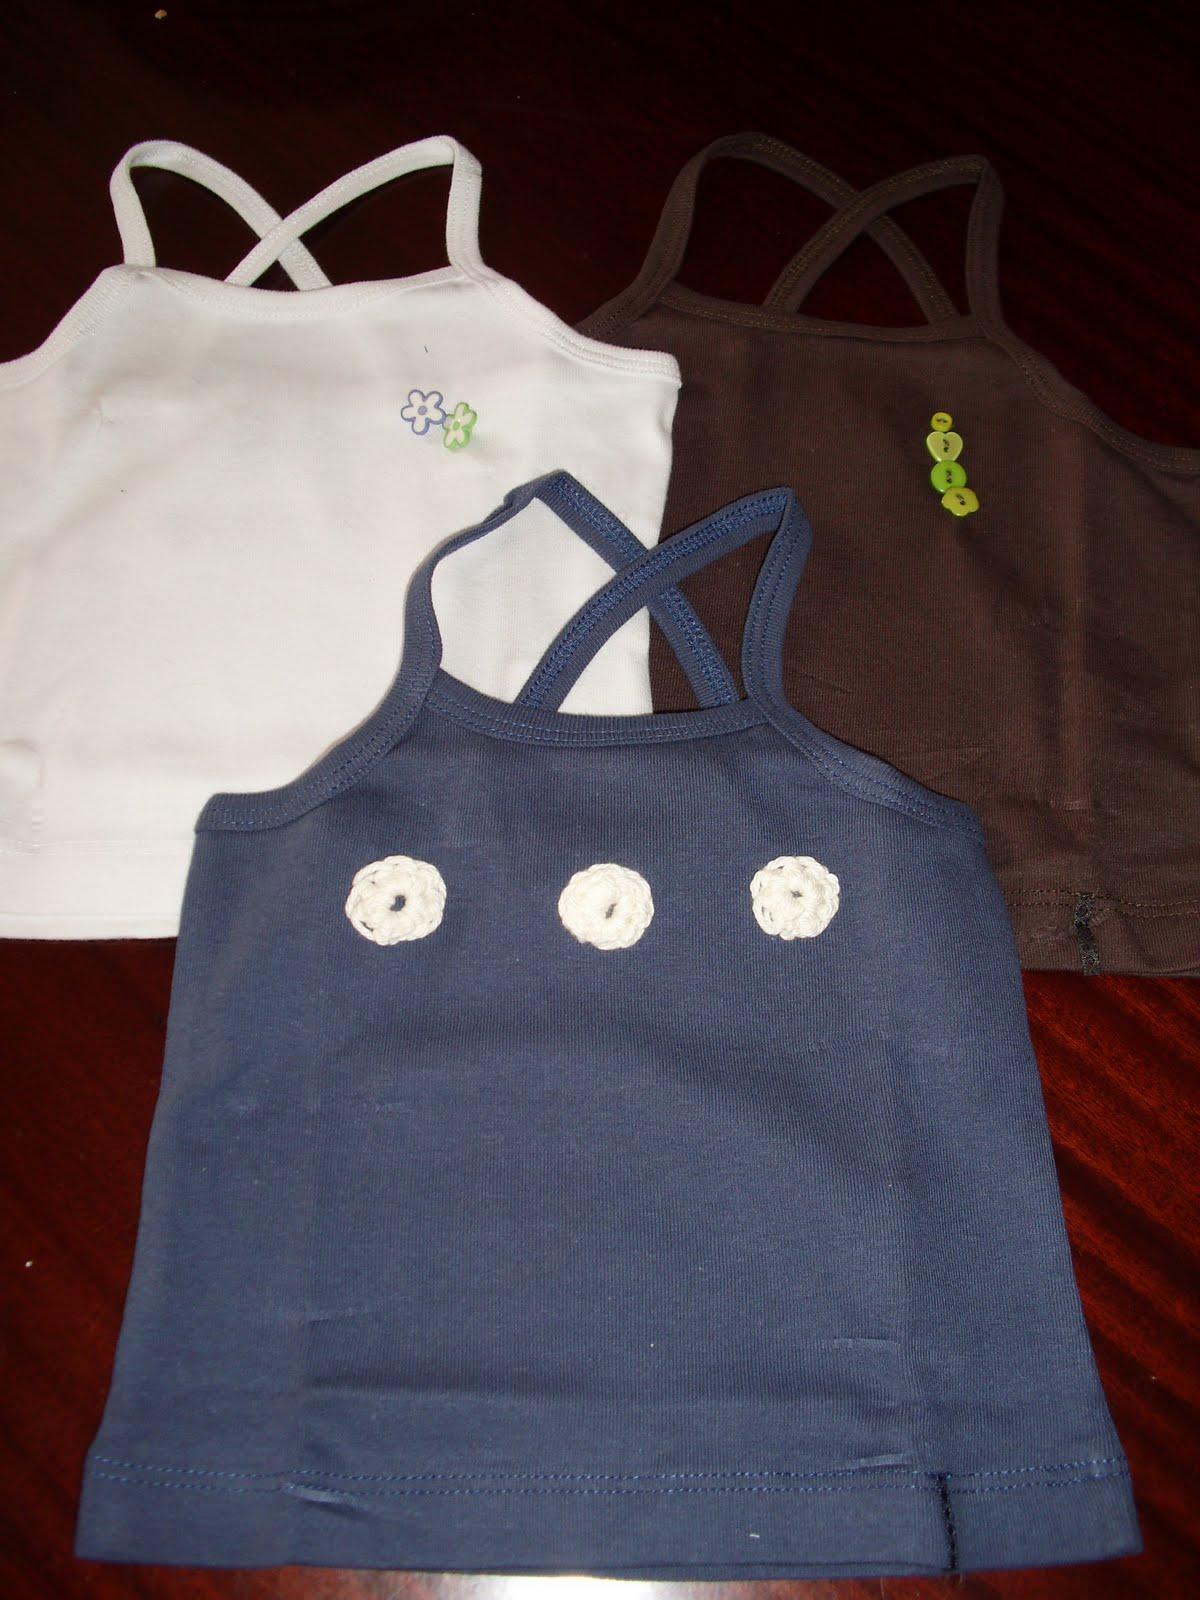 nike air max tejer camiseta - Santillana CompartirSantillana Compartir 71a19df0332